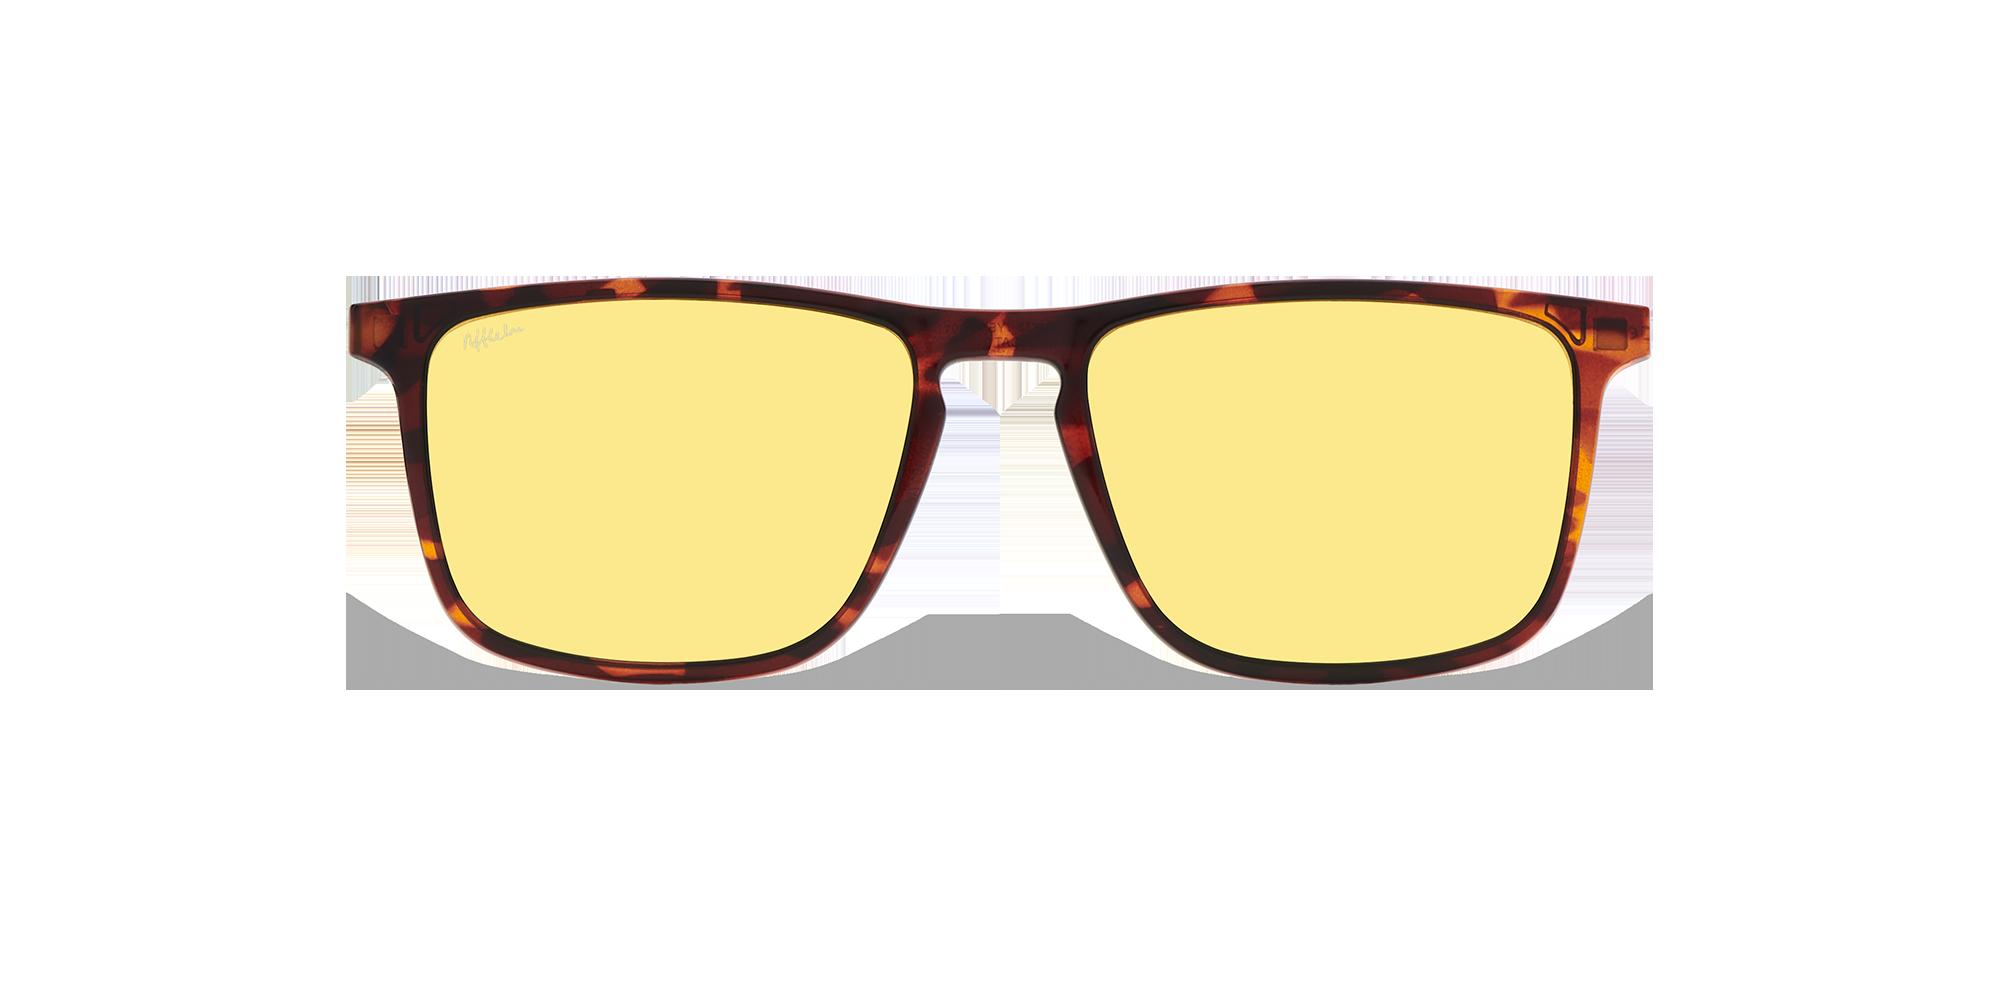 afflelou/france/products/smart_clip/clips_glasses/07630036428825_face.png